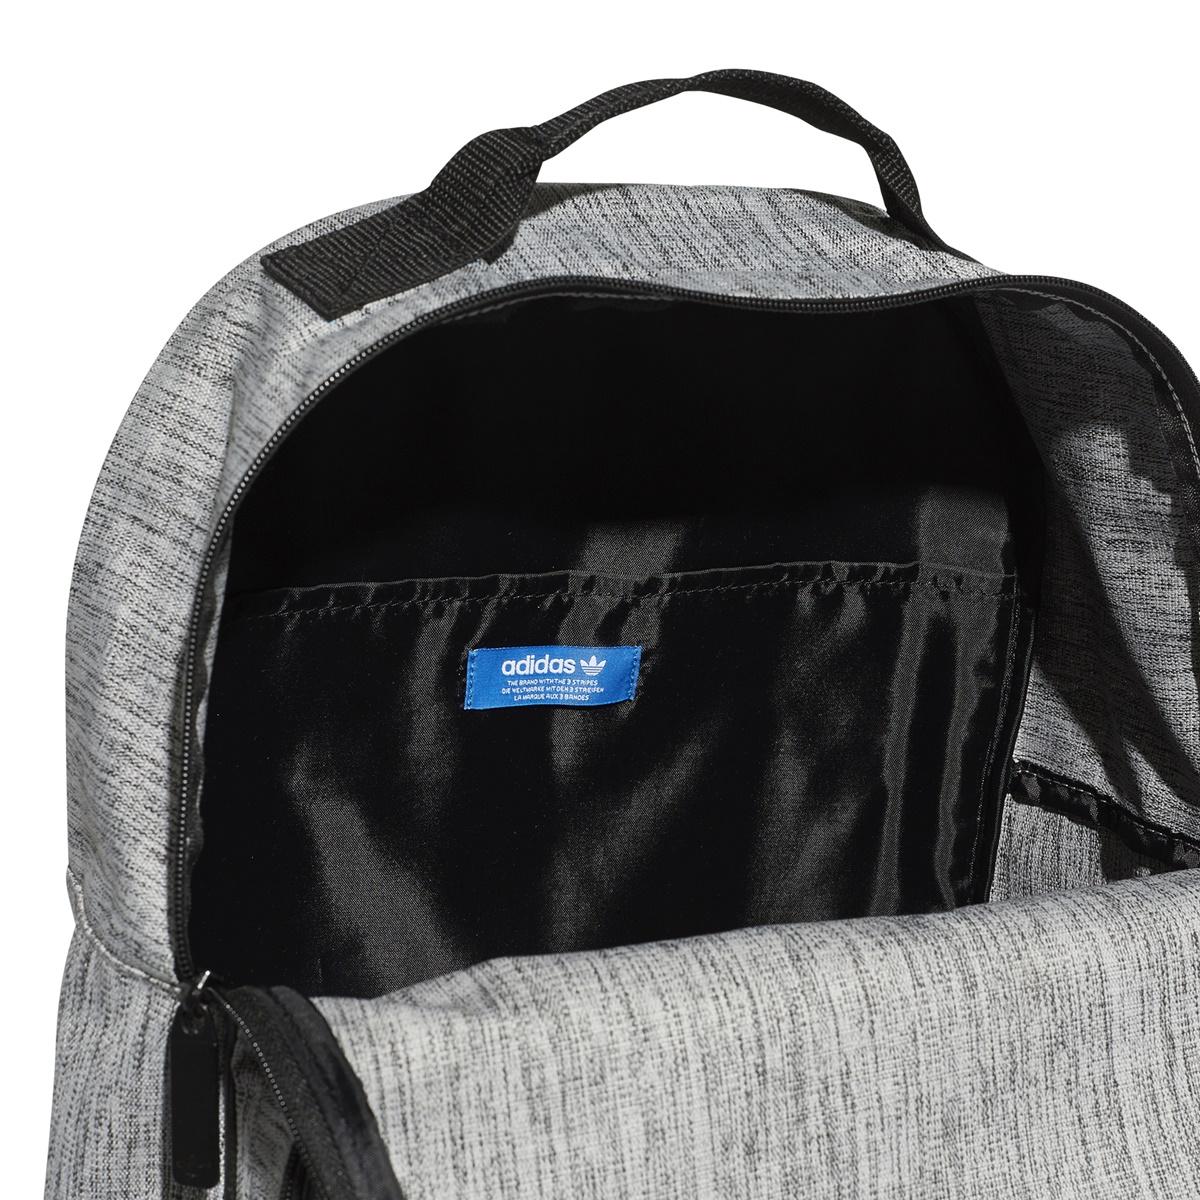 Adidas Originals Mochila Classic Casual Trefoil Grey Black 03428436f6732